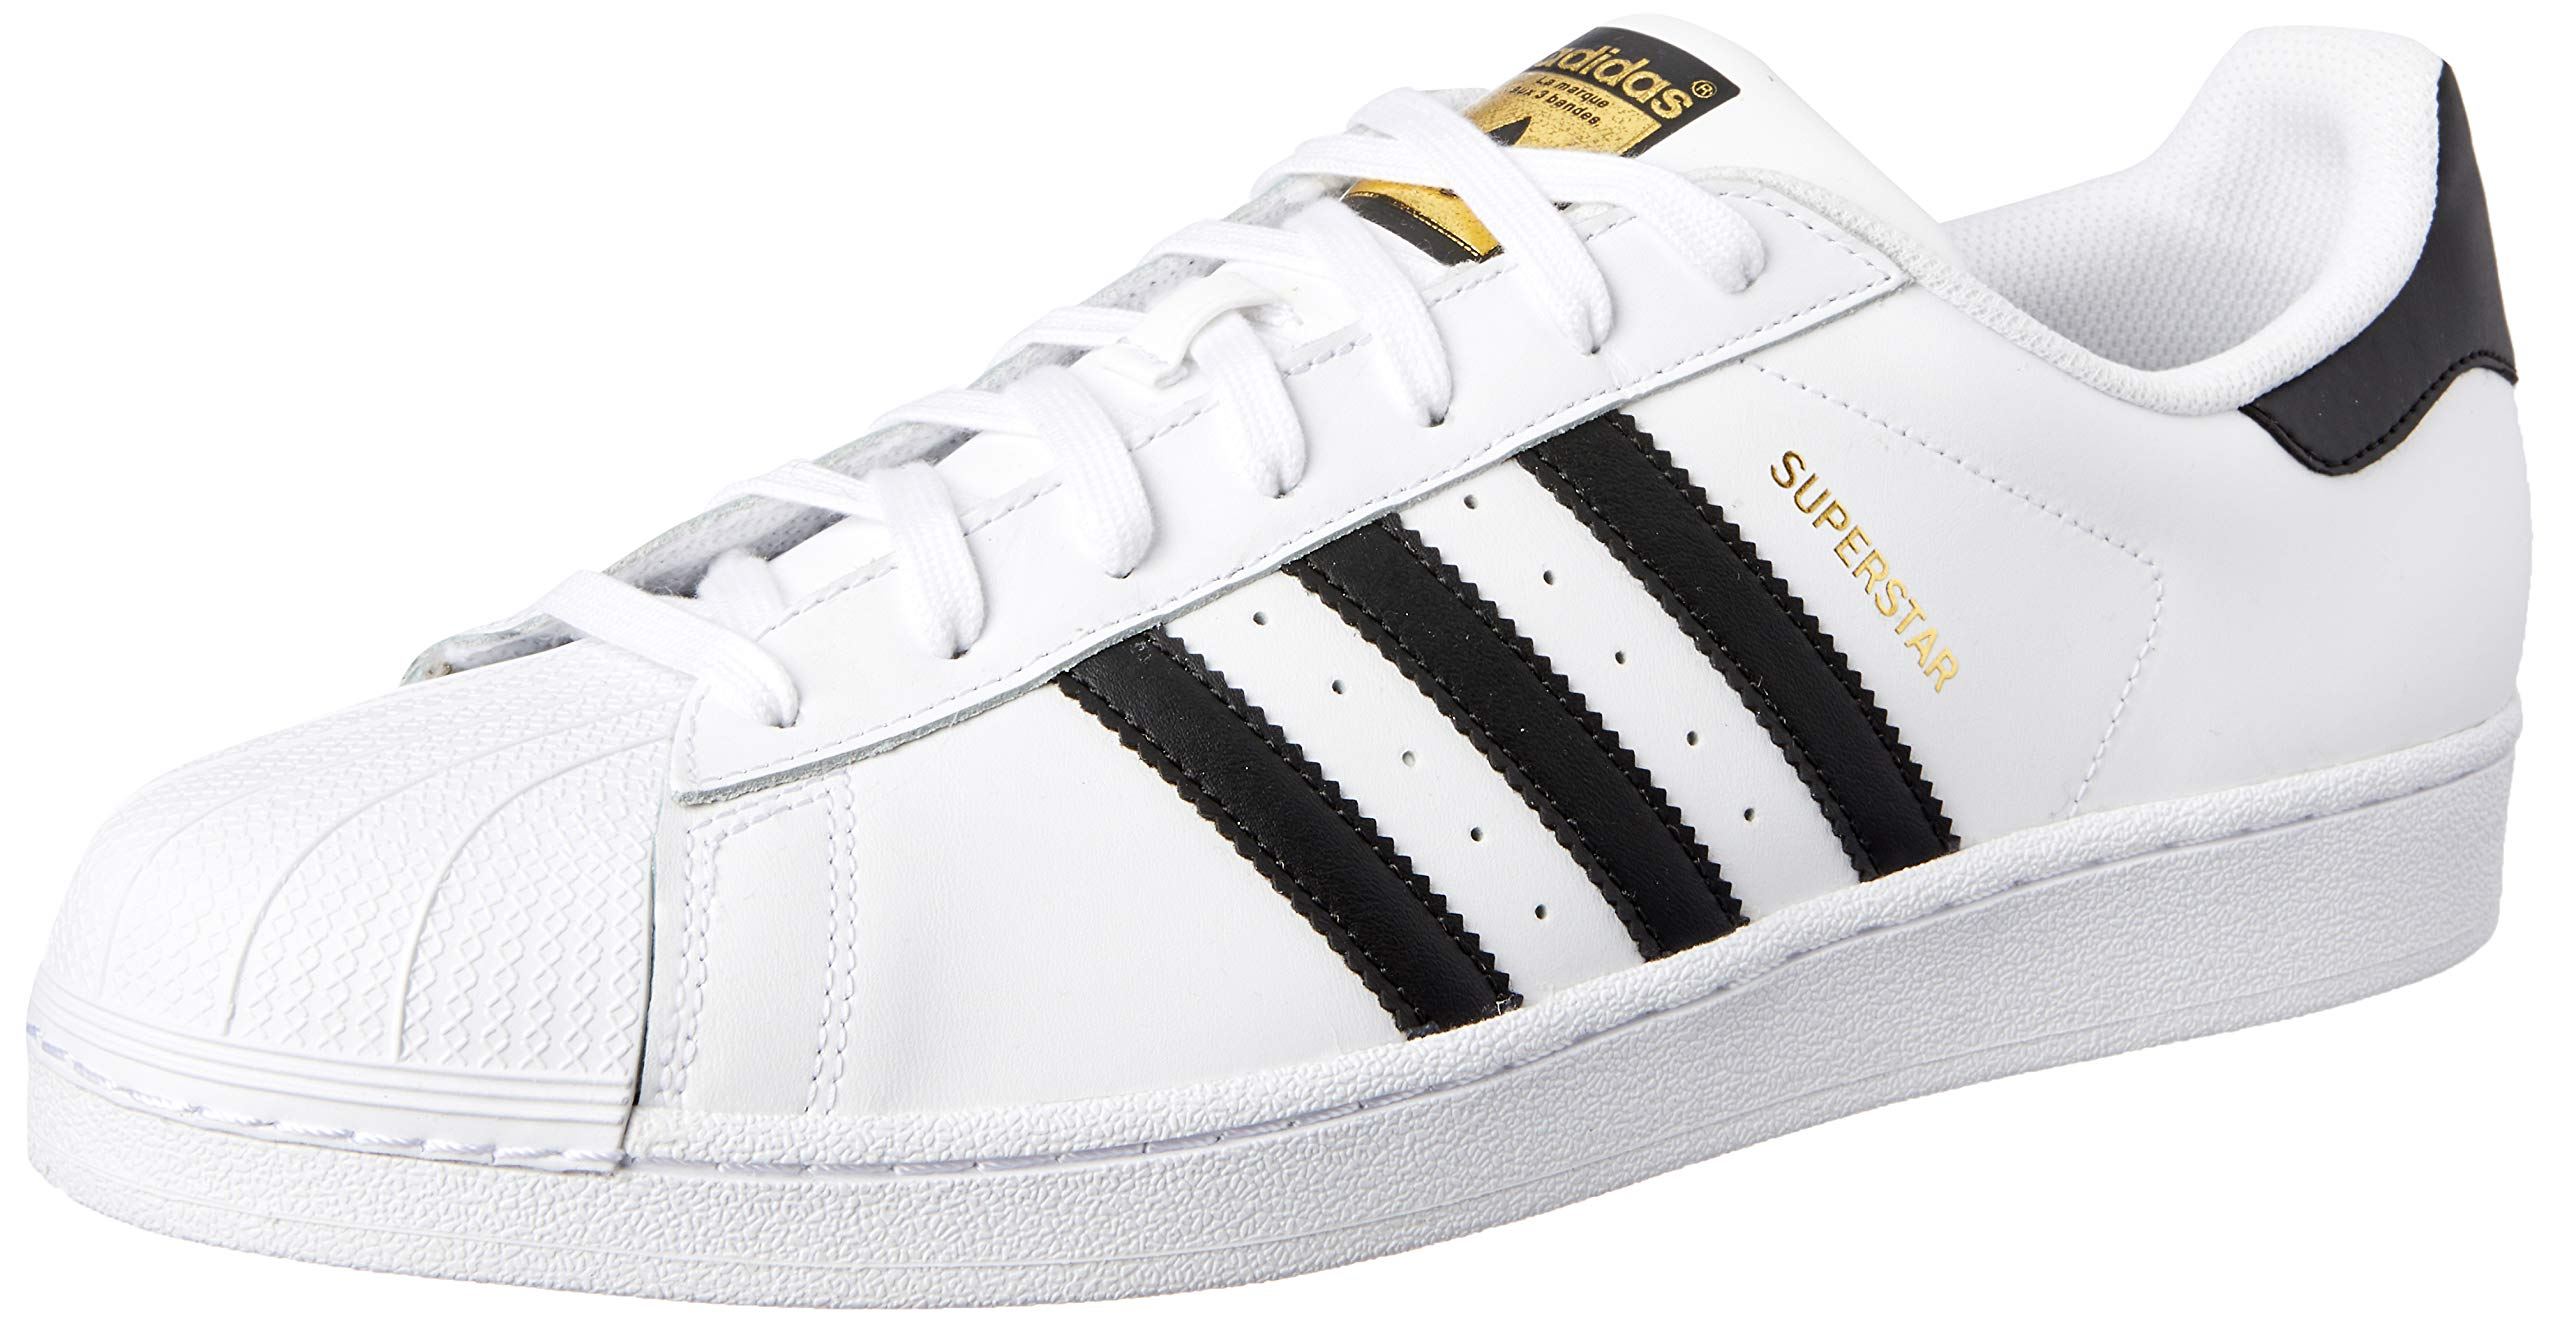 adidas Originals Men's Superstar Casual Sneaker, White/Core Black/White, 8.5 M US by adidas Originals